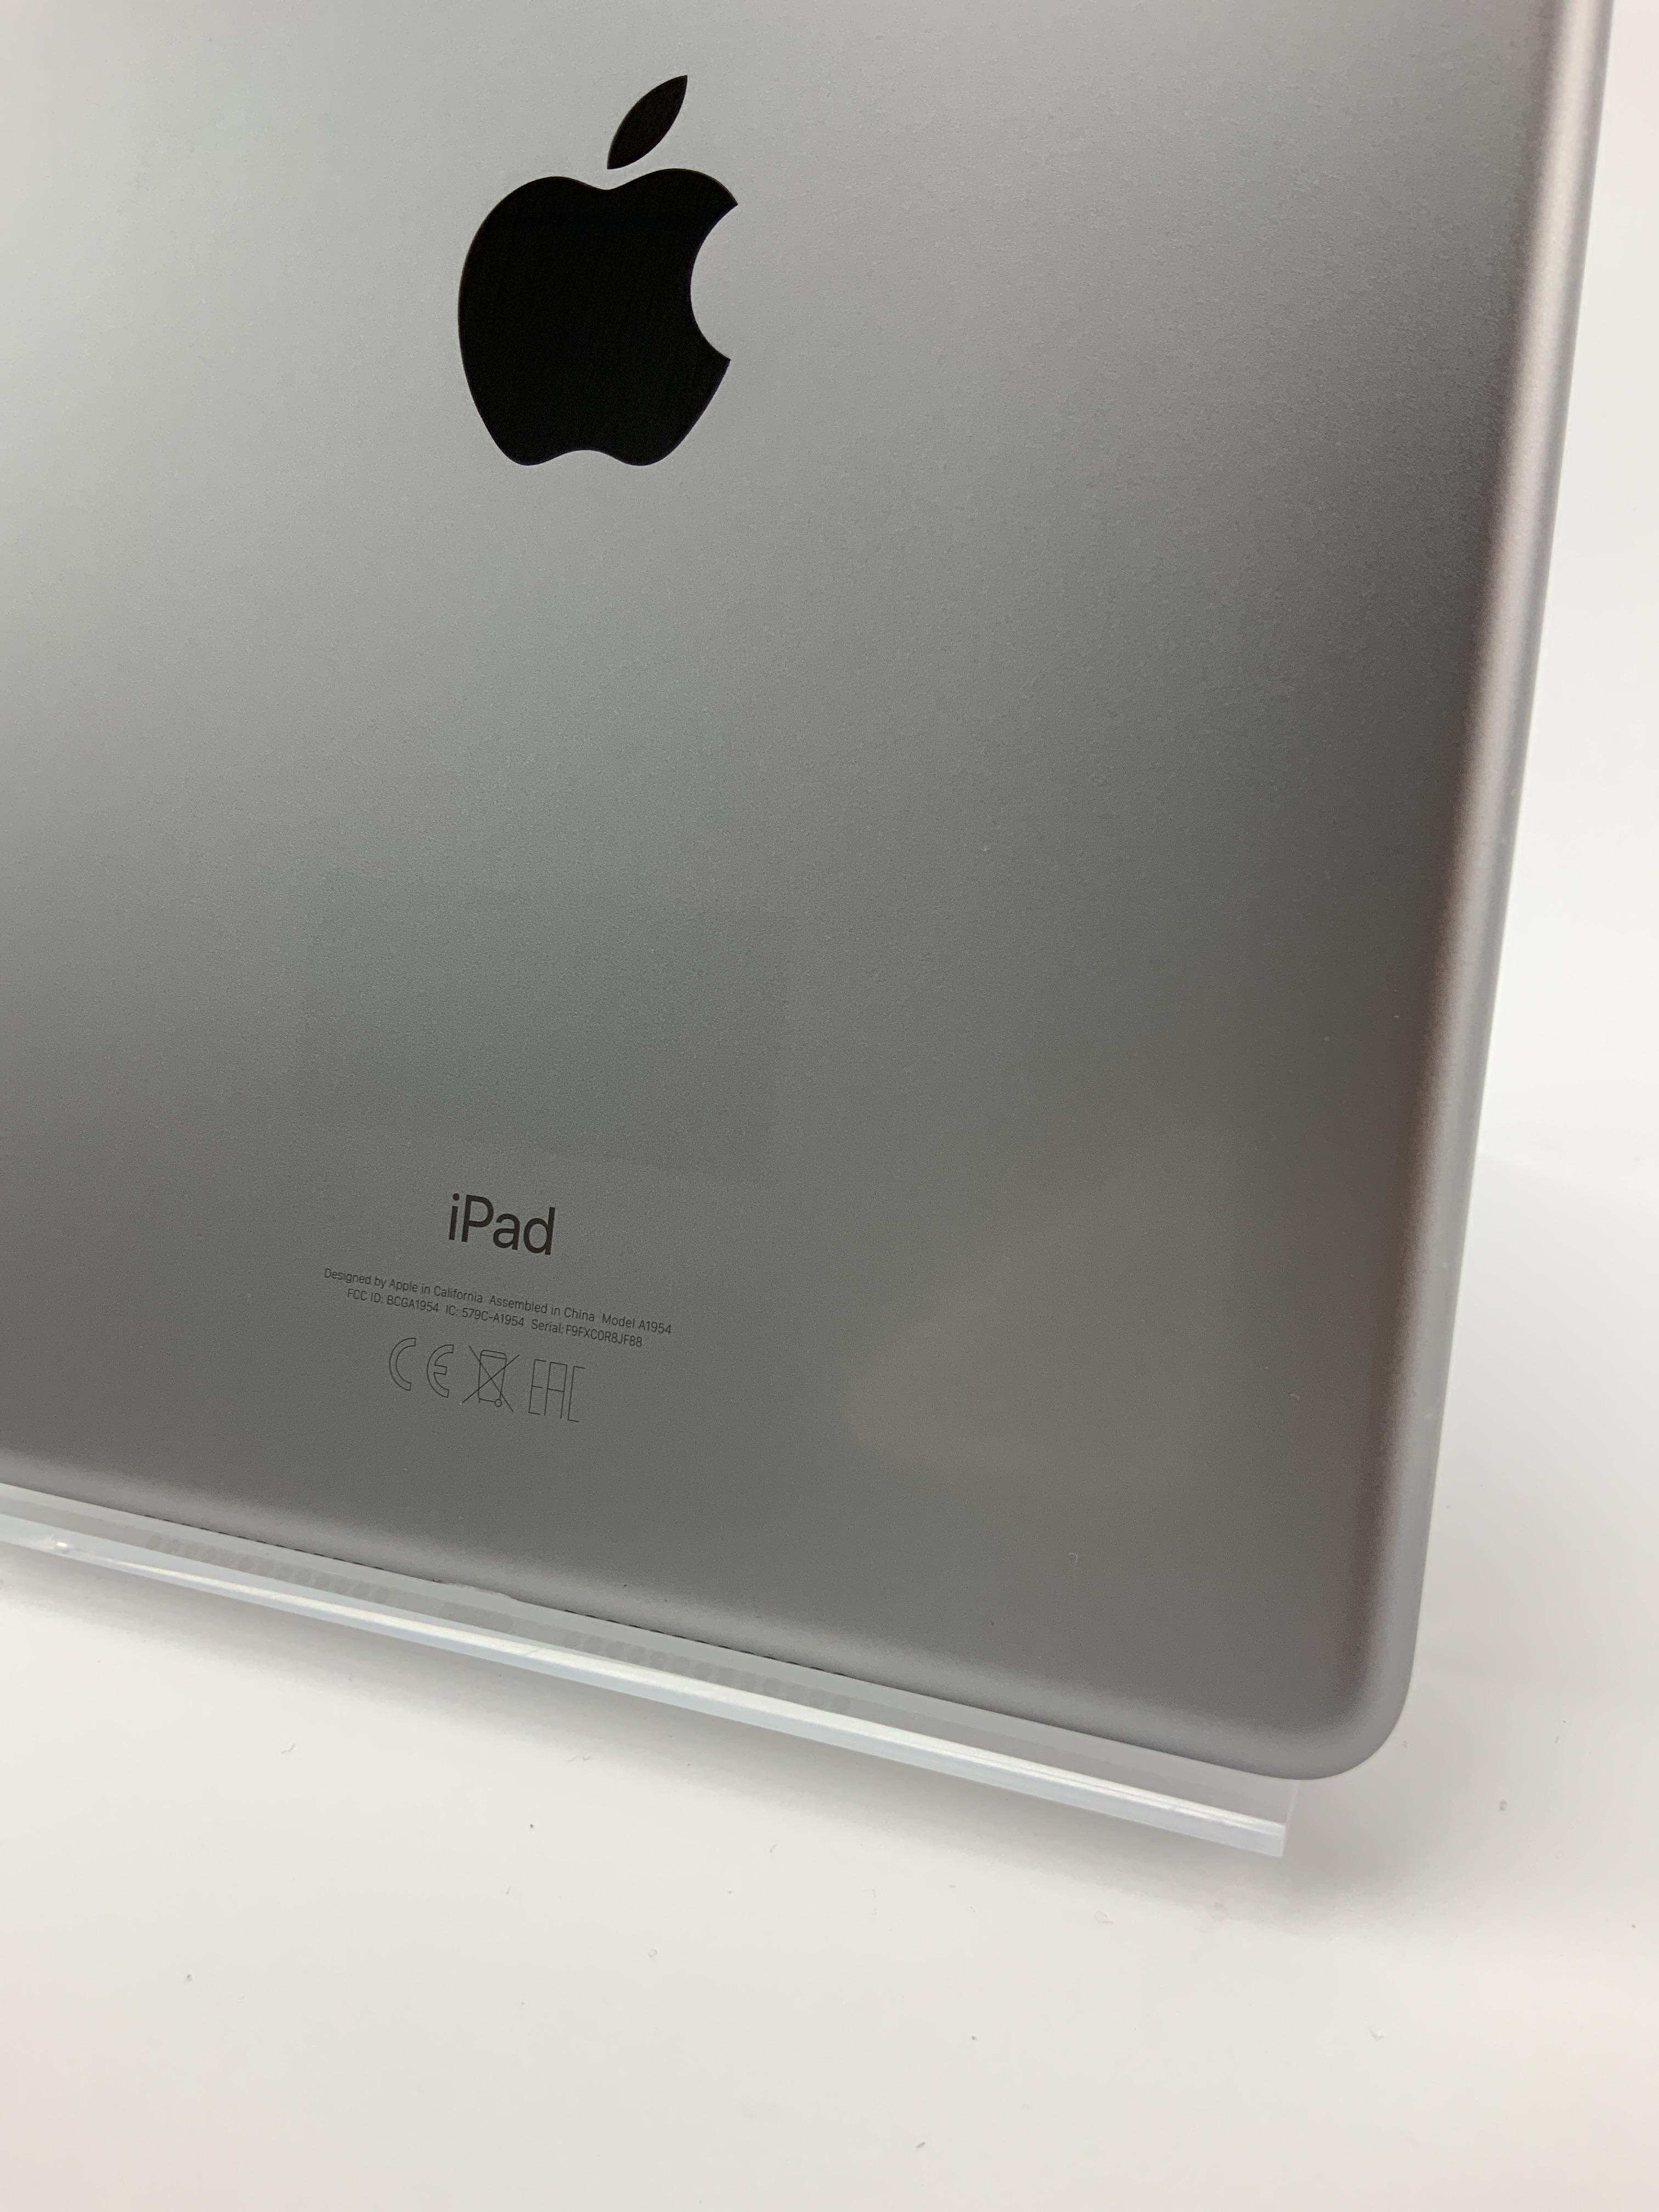 iPad 6 Wi-Fi + Cellular 32GB, 32GB, Space Gray, Bild 4